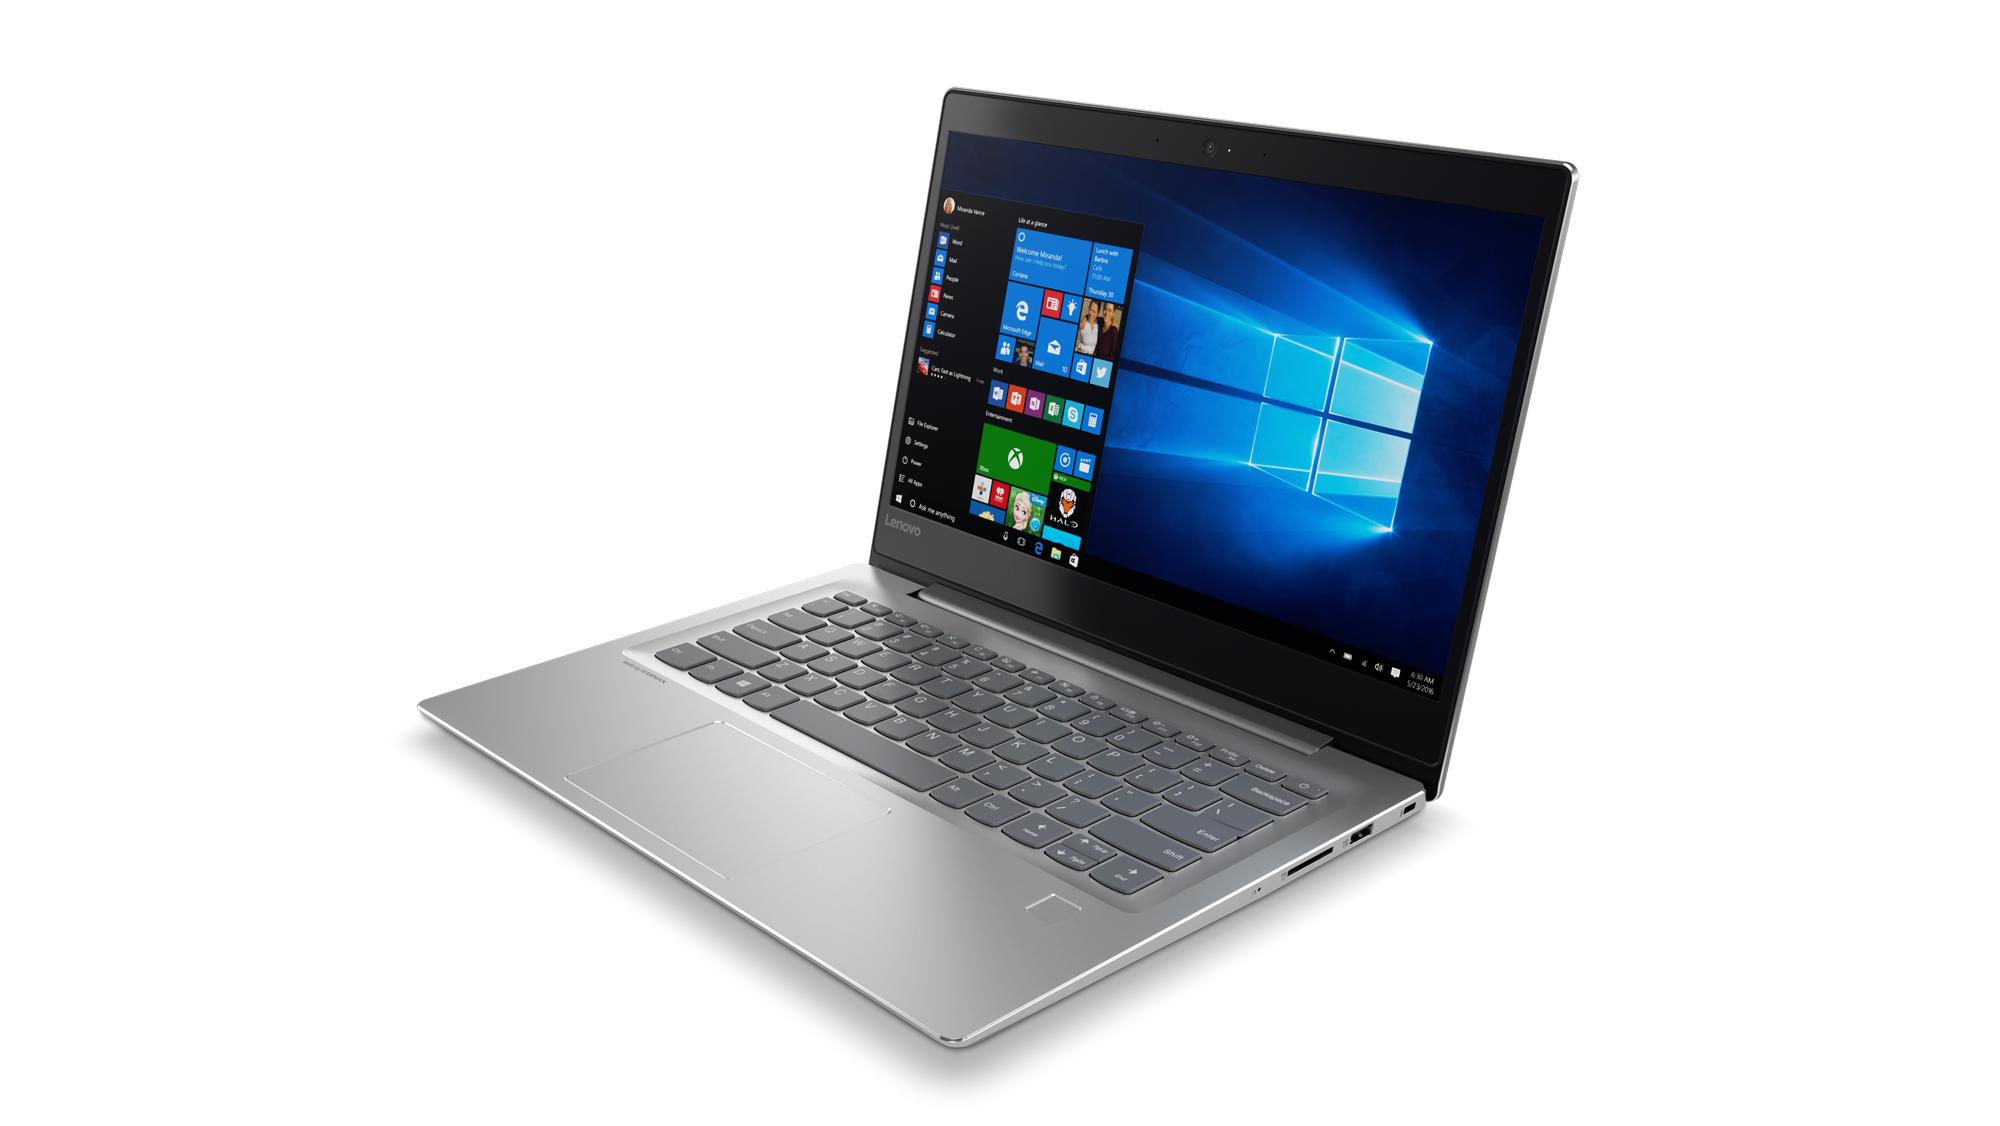 80X2002WCK Lenovo IdeaPad 520S 14.0 FHD IPS AG/i5-7200U/8G/256SSD/940MX-2G/W10H/Backlit/720p/Šedá